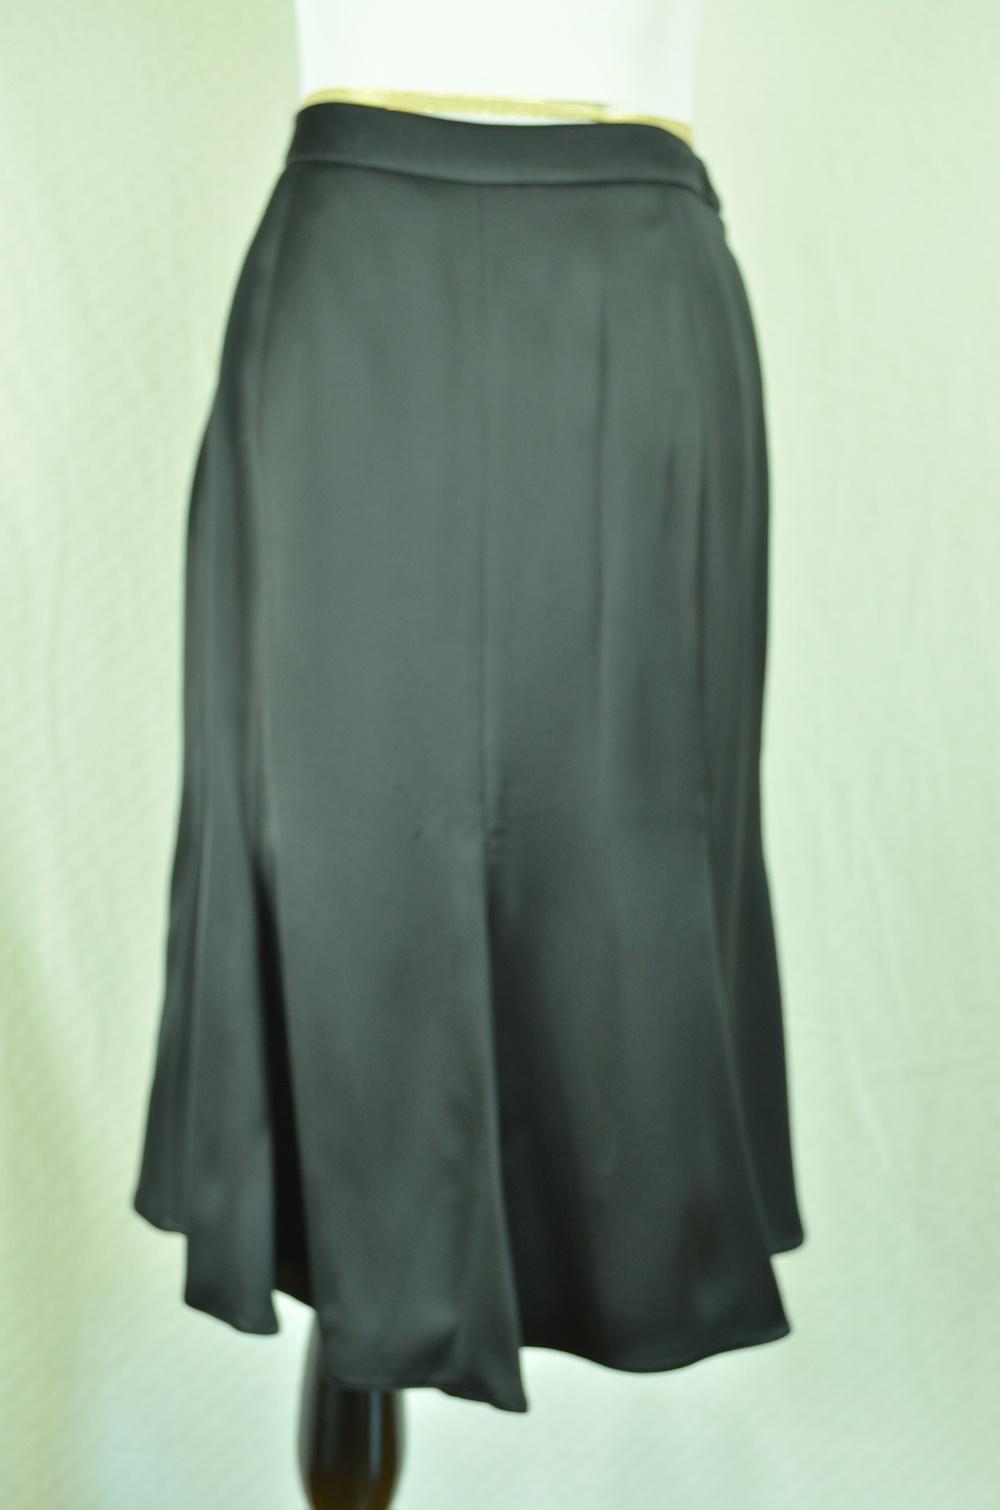 50. Giorgio Armani Silk Skirt